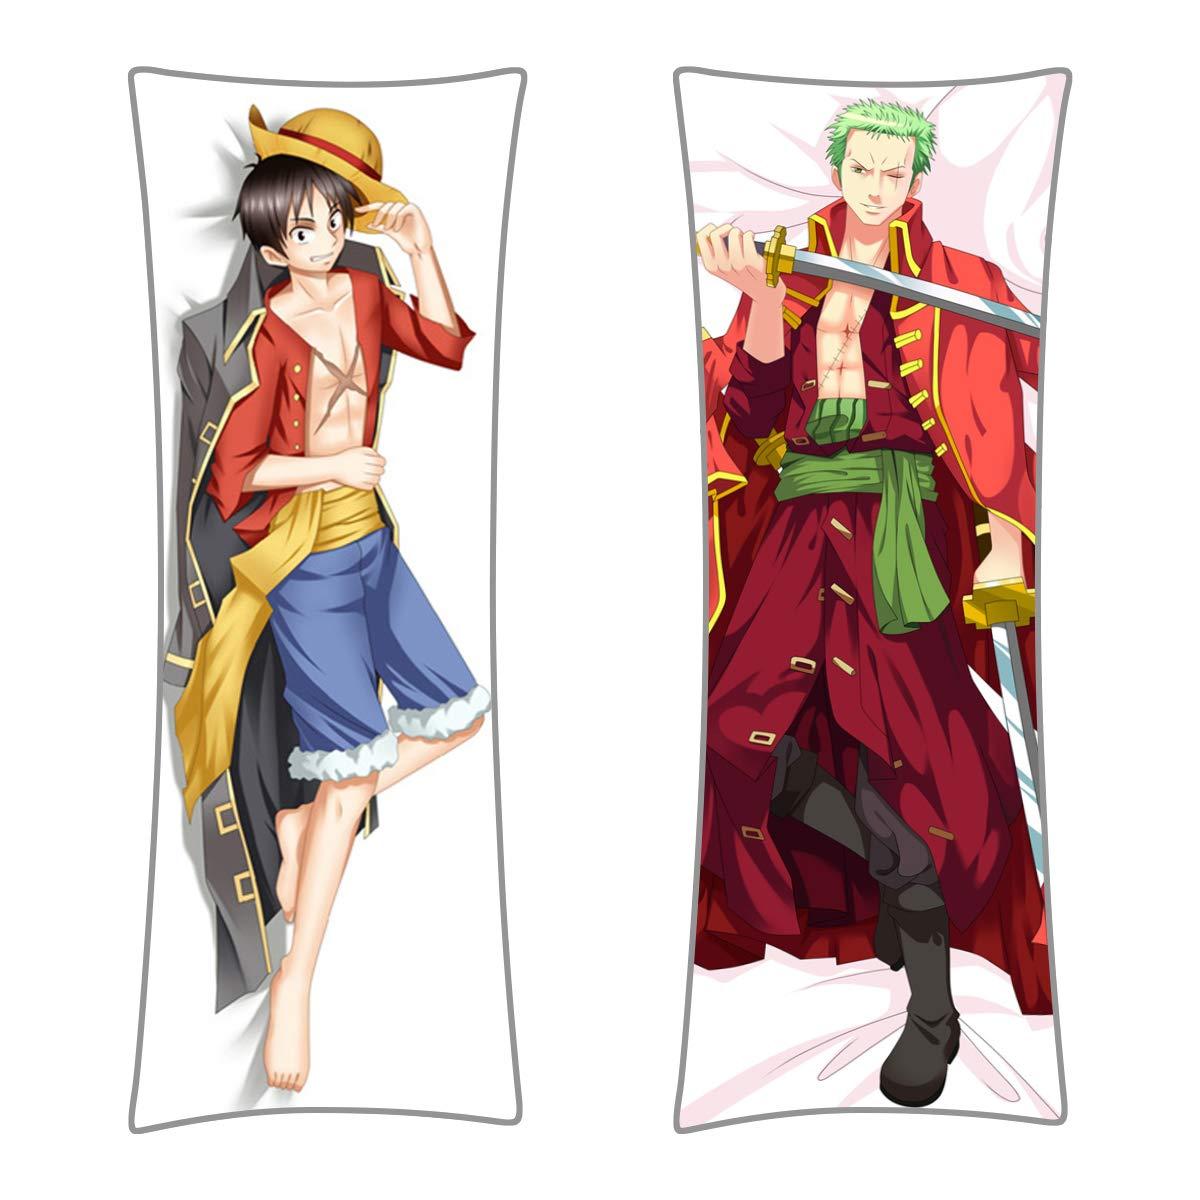 CoolChange One Piece Umarmungskissen Bezug, Dakimakura Kissenbezug 150x50cm, 150x50cm, 150x50cm, Motiv  Ruffy Zorro B07CP27GQ1 Zierkissenbezüge 711562